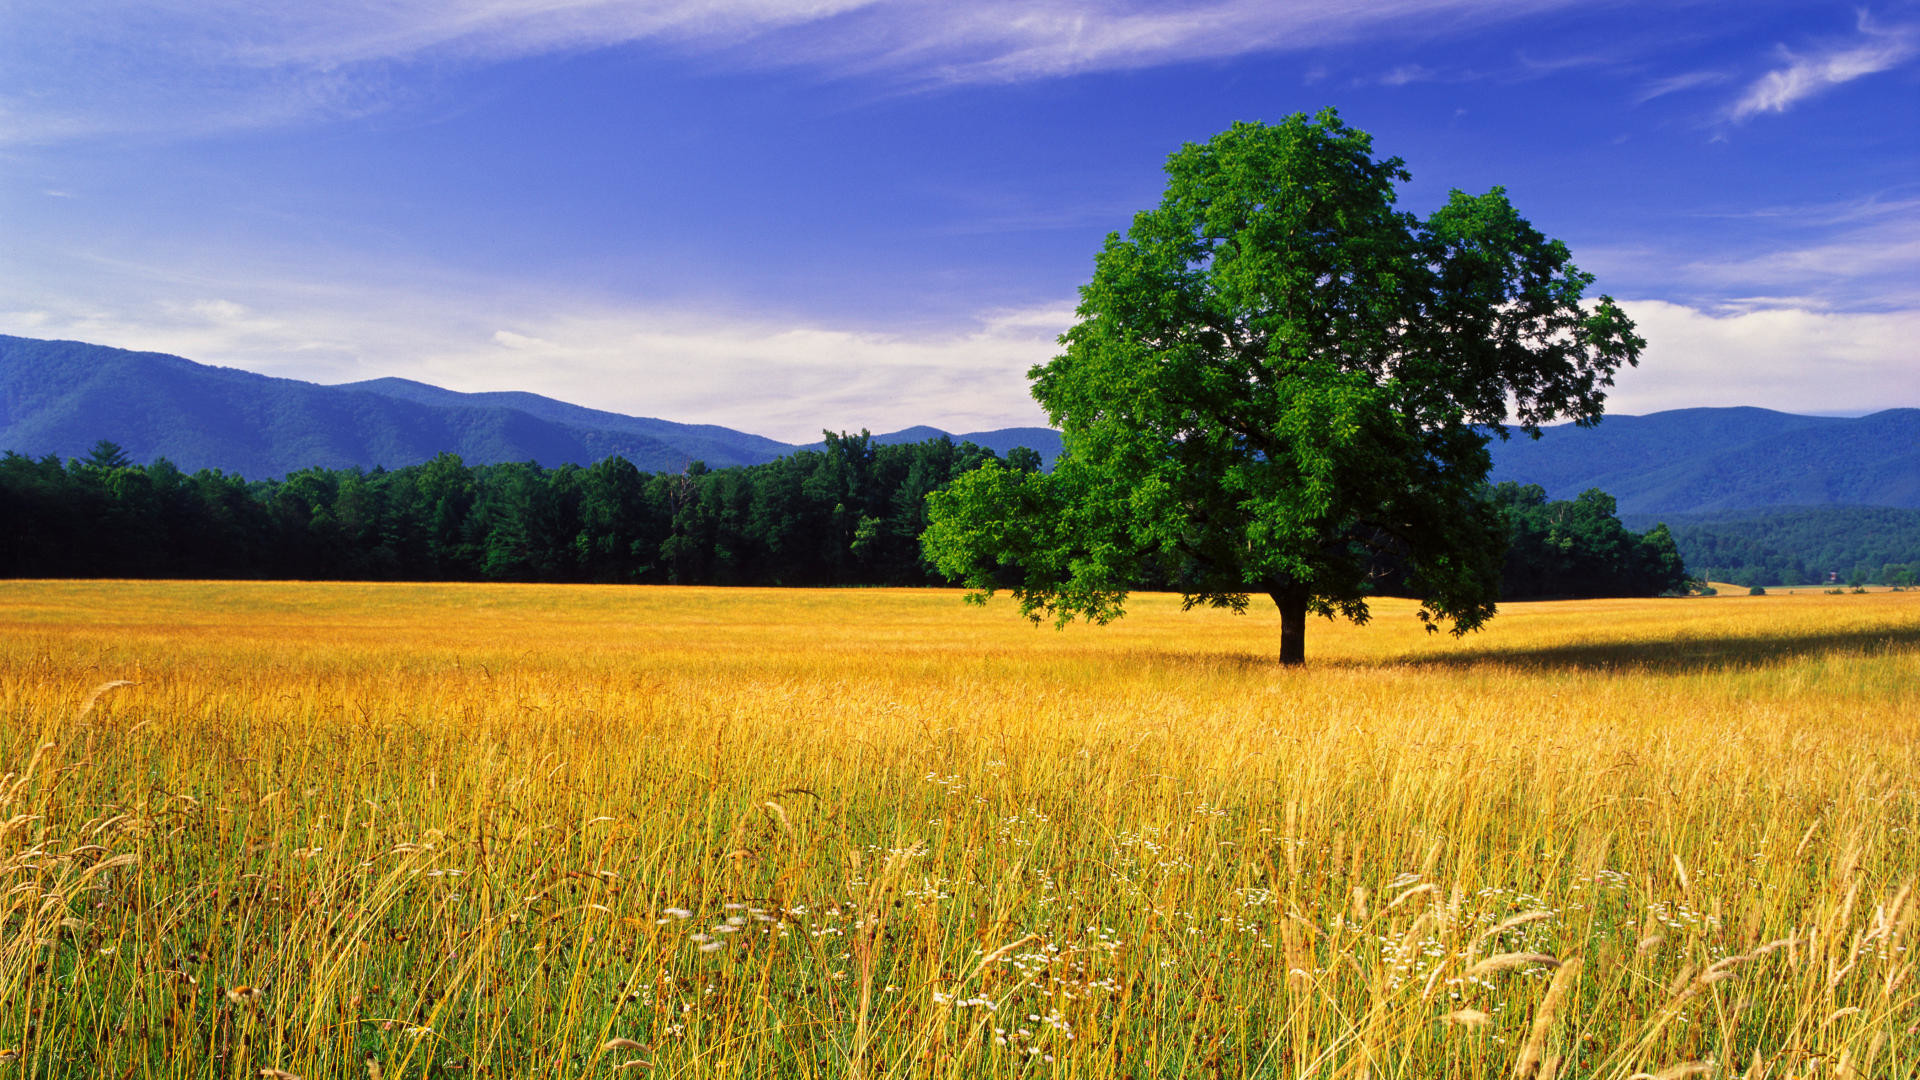 Landscape HD Wallpapers Free Dowload